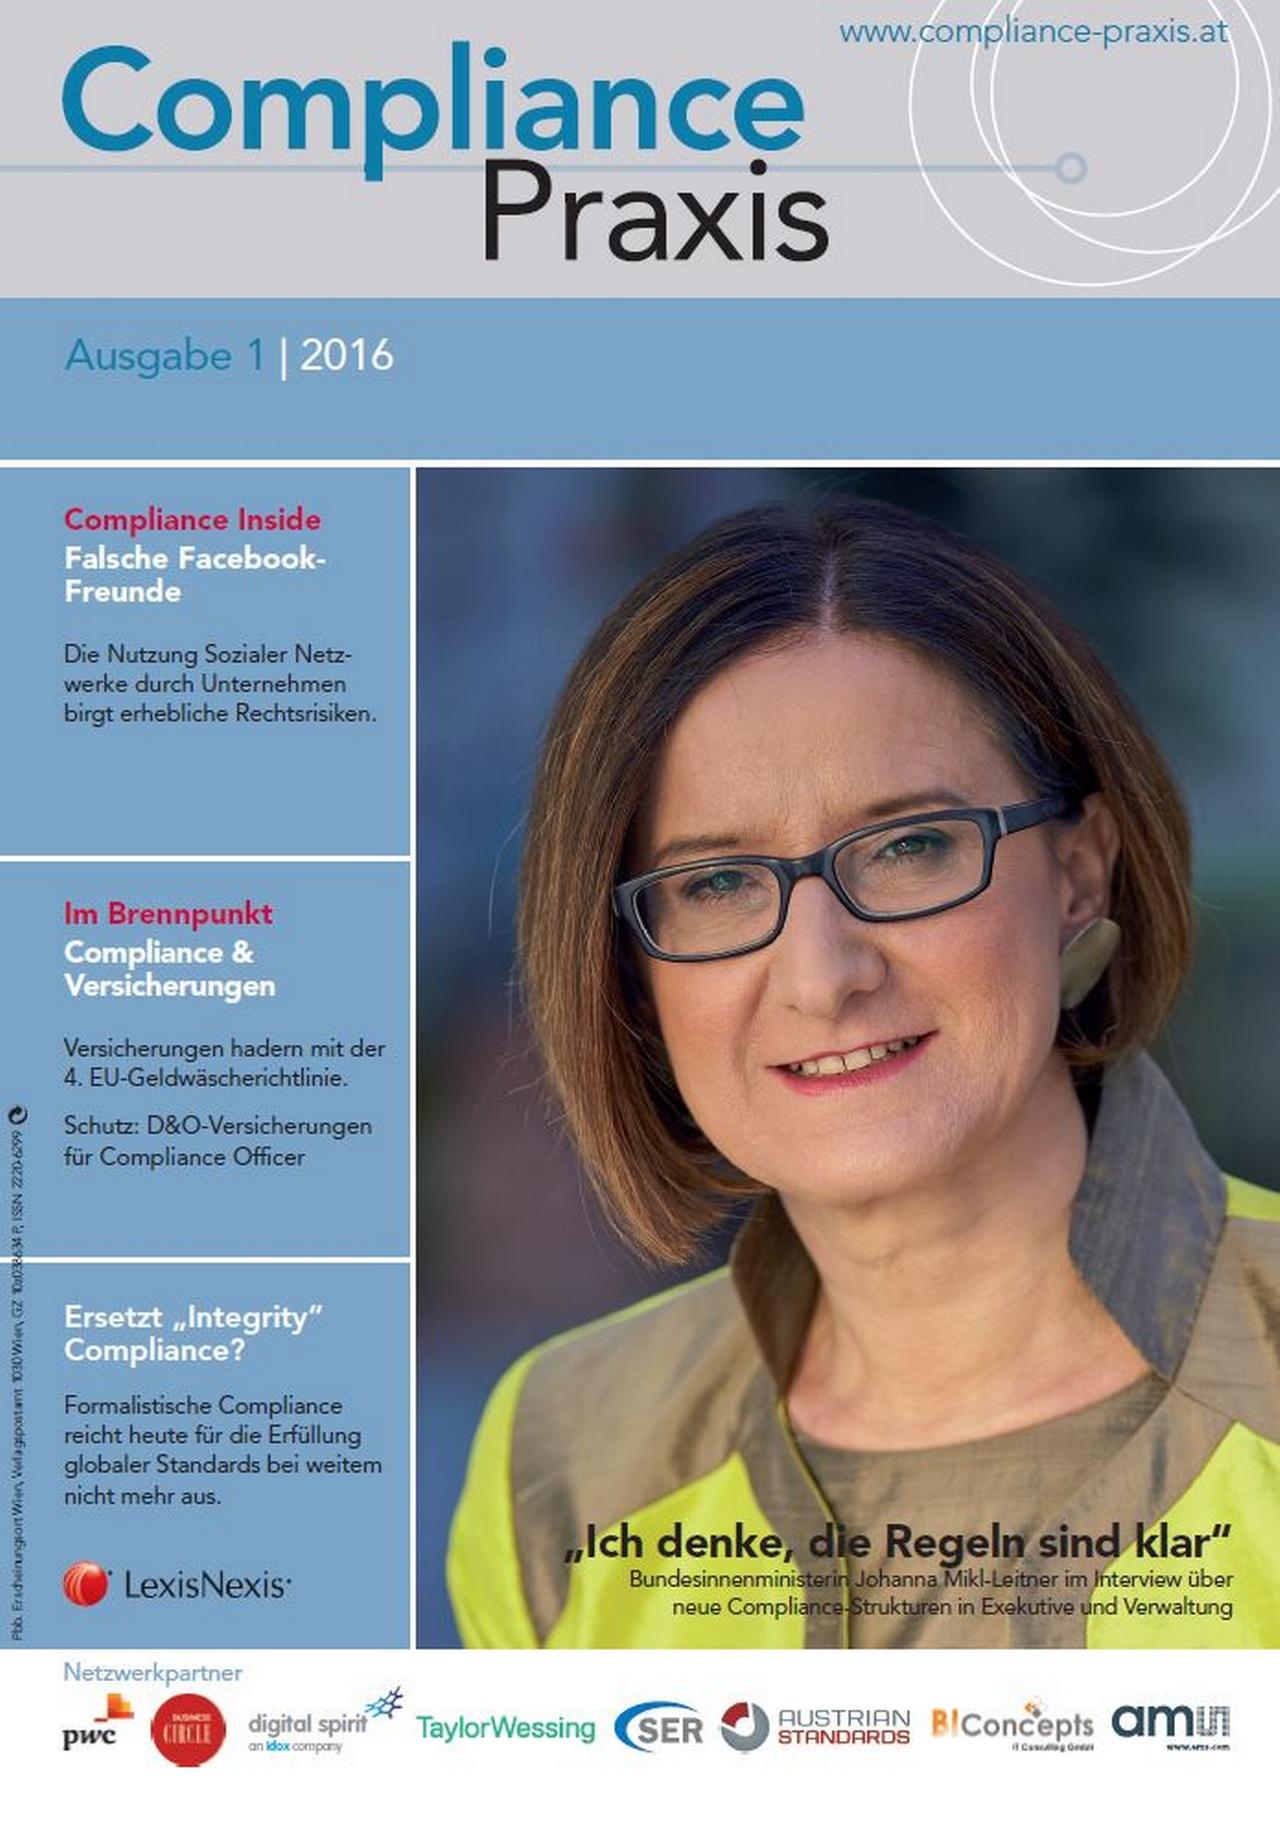 Cover von Compliance Praxis Ausgabe 1/2016, © LexisNexis